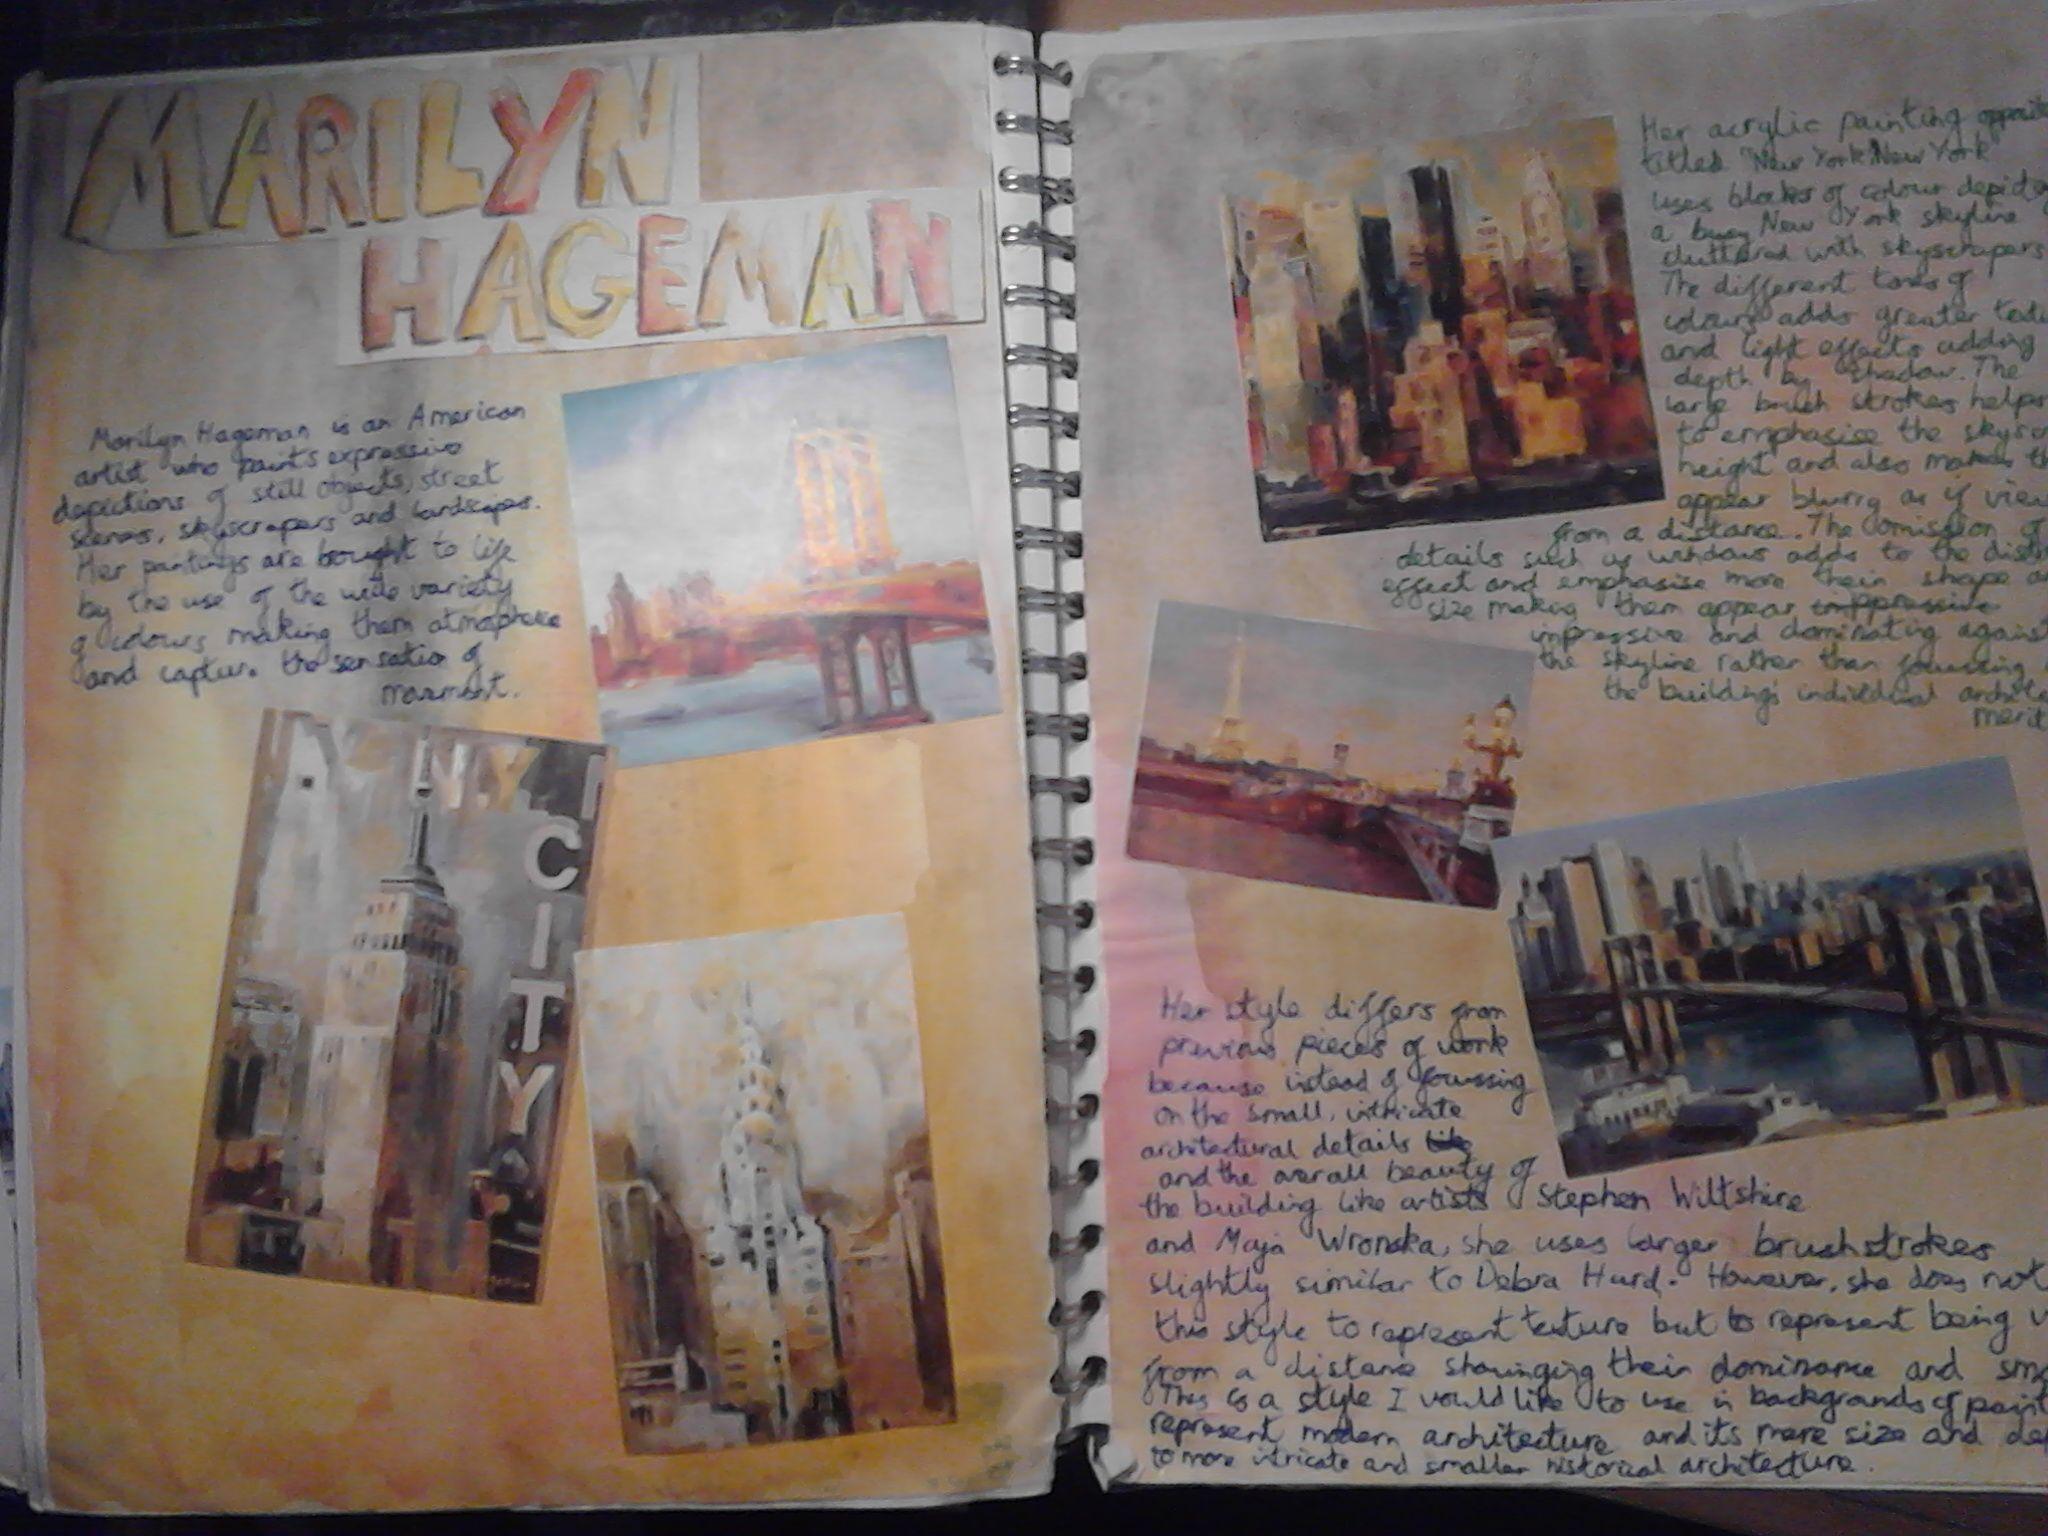 Marilyn Hageman Artist Research Page